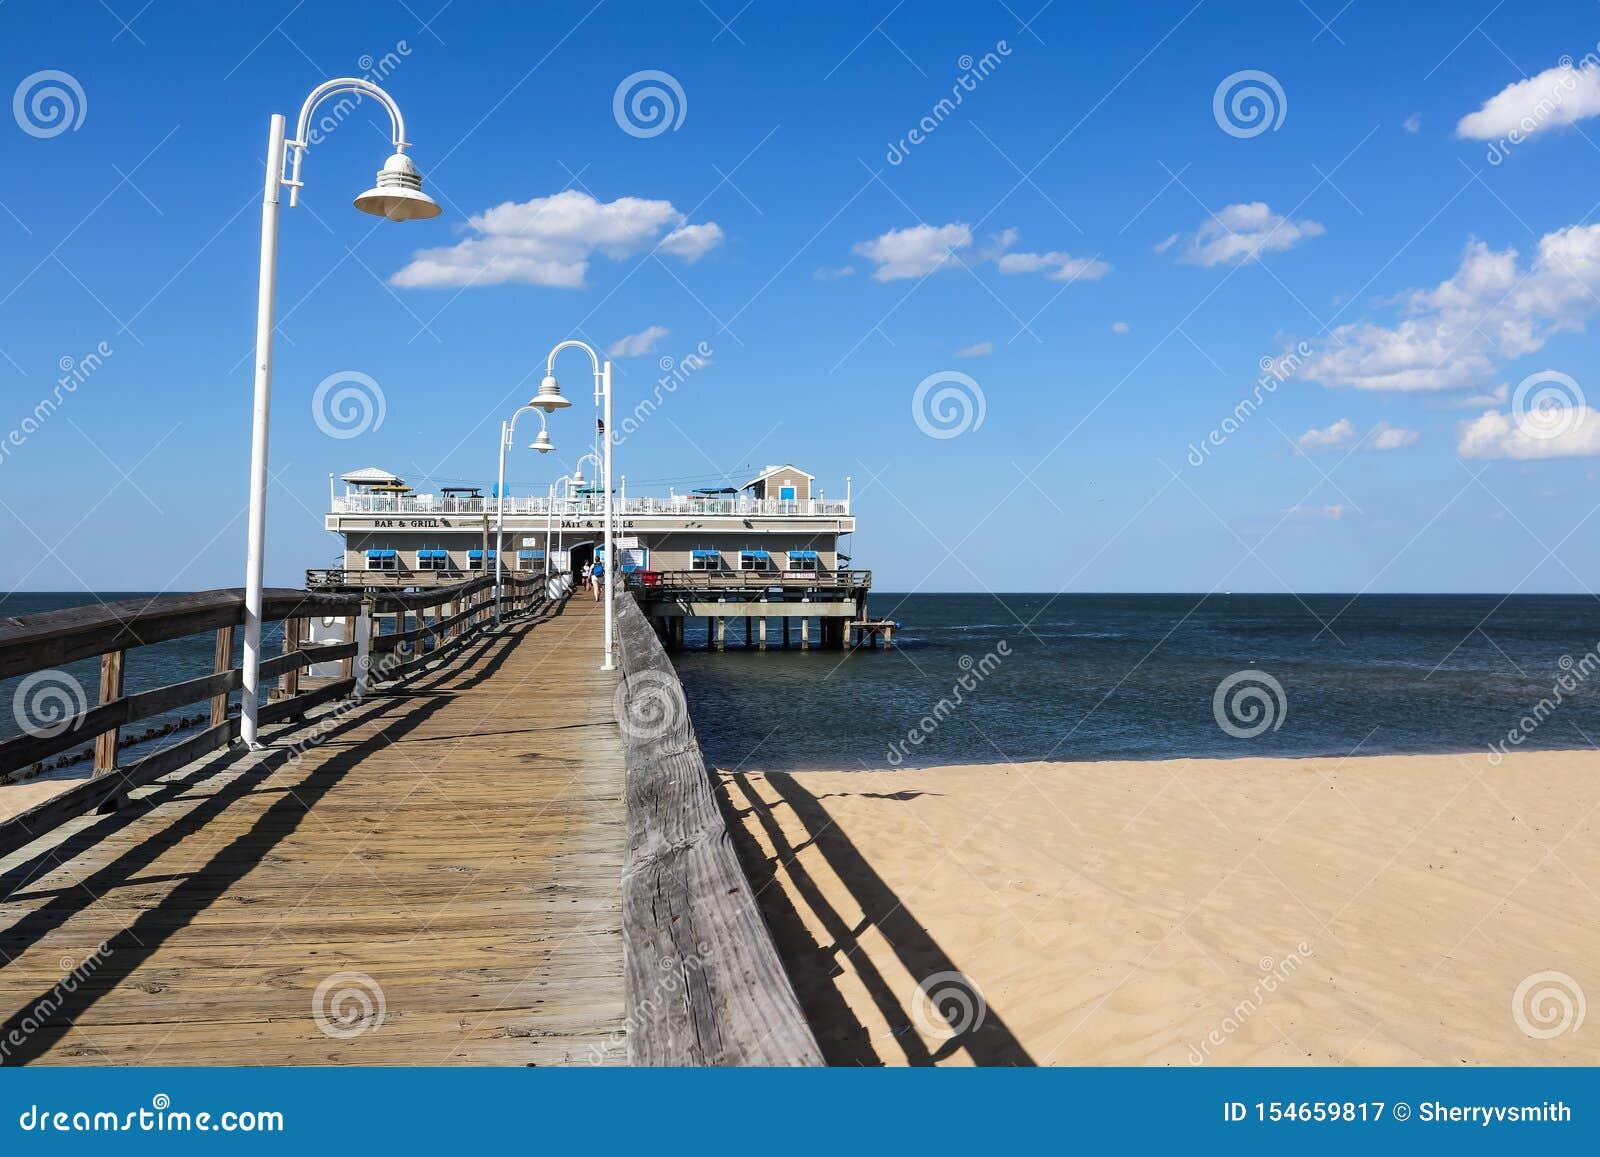 Ocean View Fishing Pier and Restaurant in Norfolk, VA